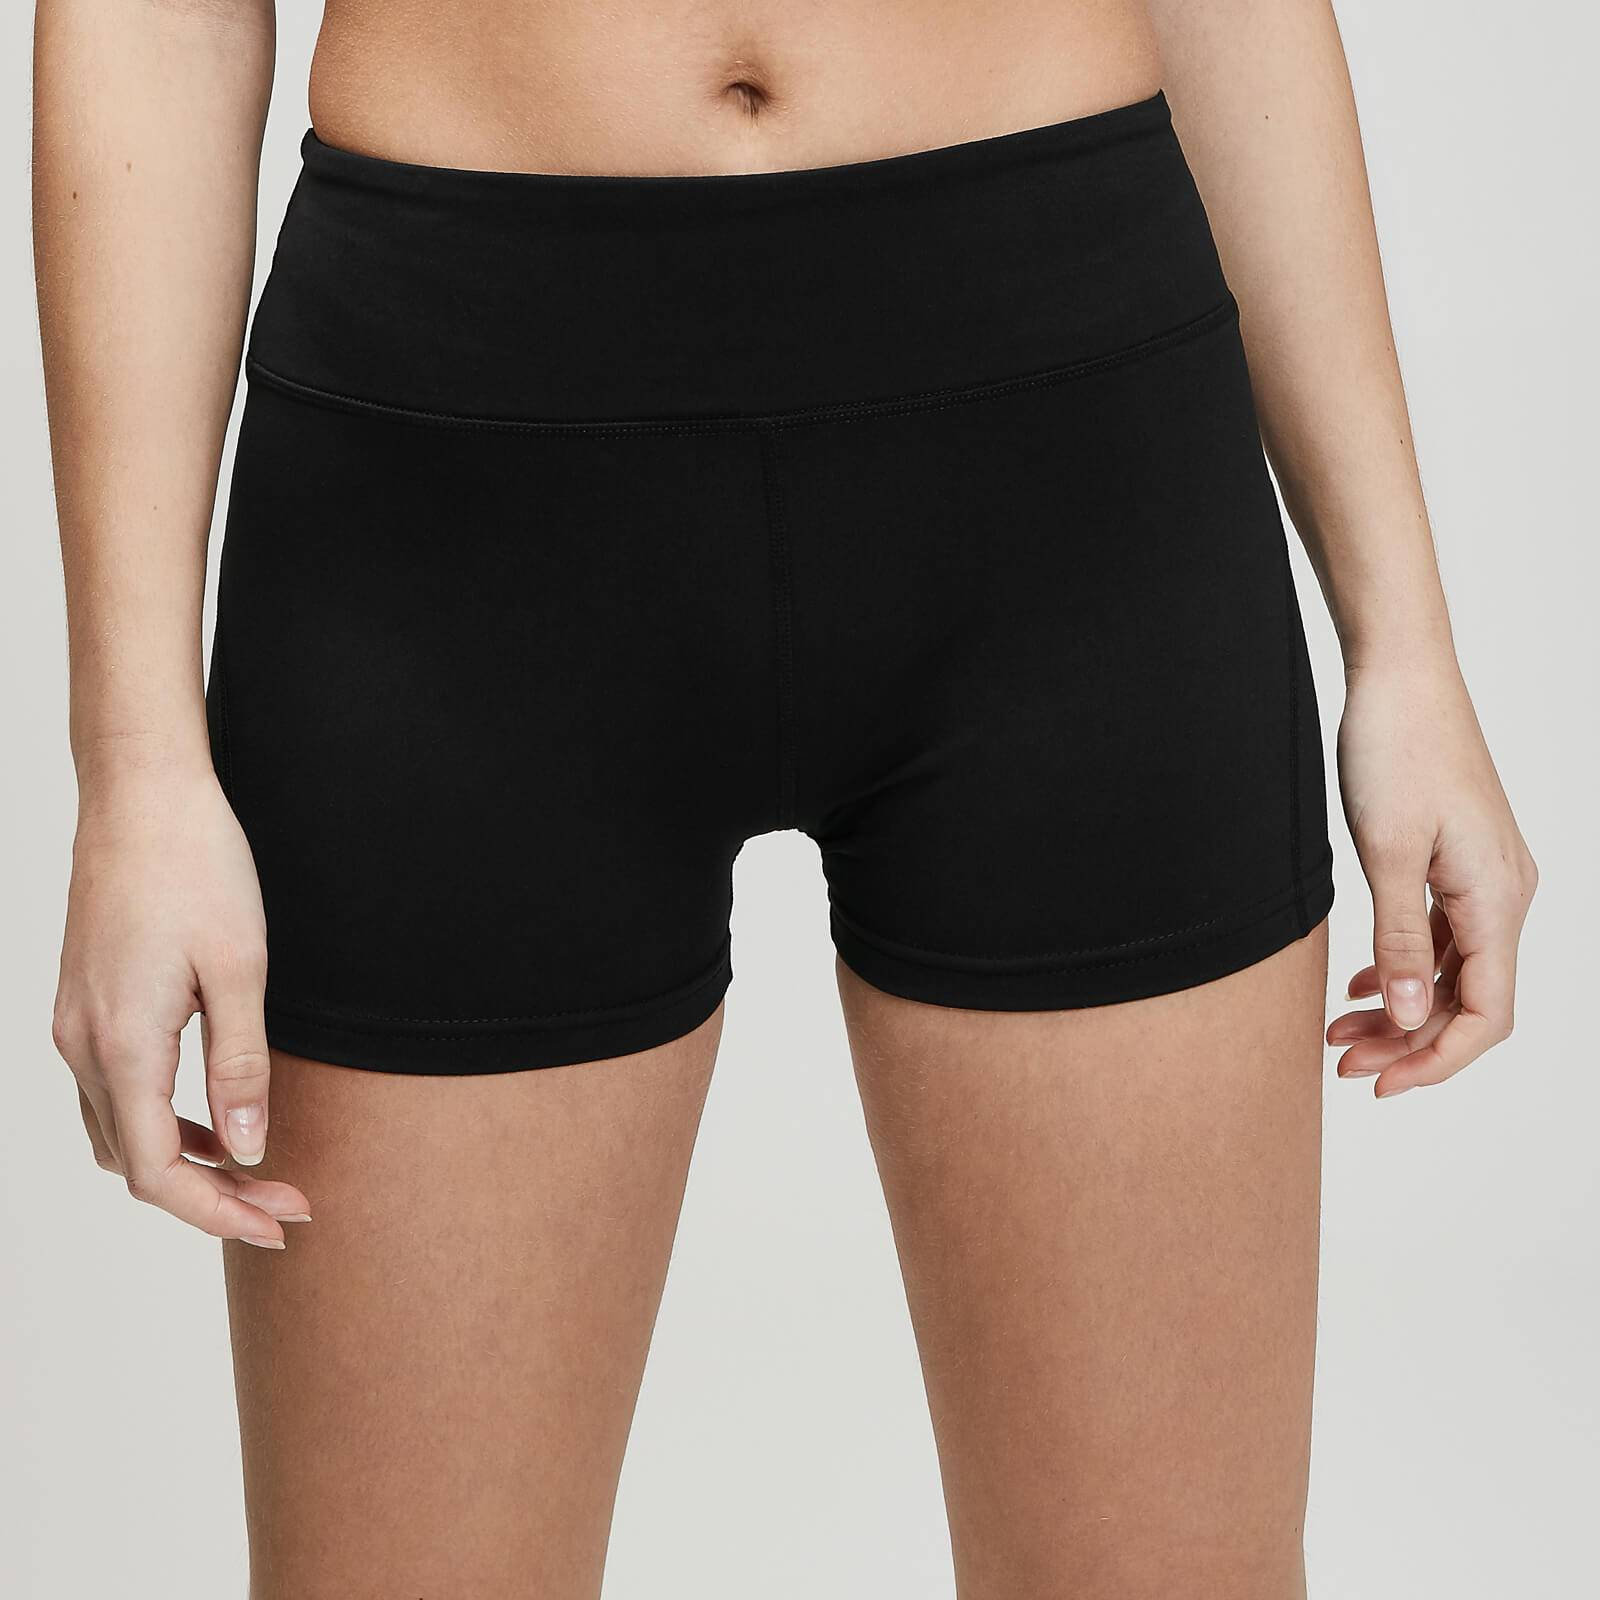 MP Women's Power Shorts - Black - XS